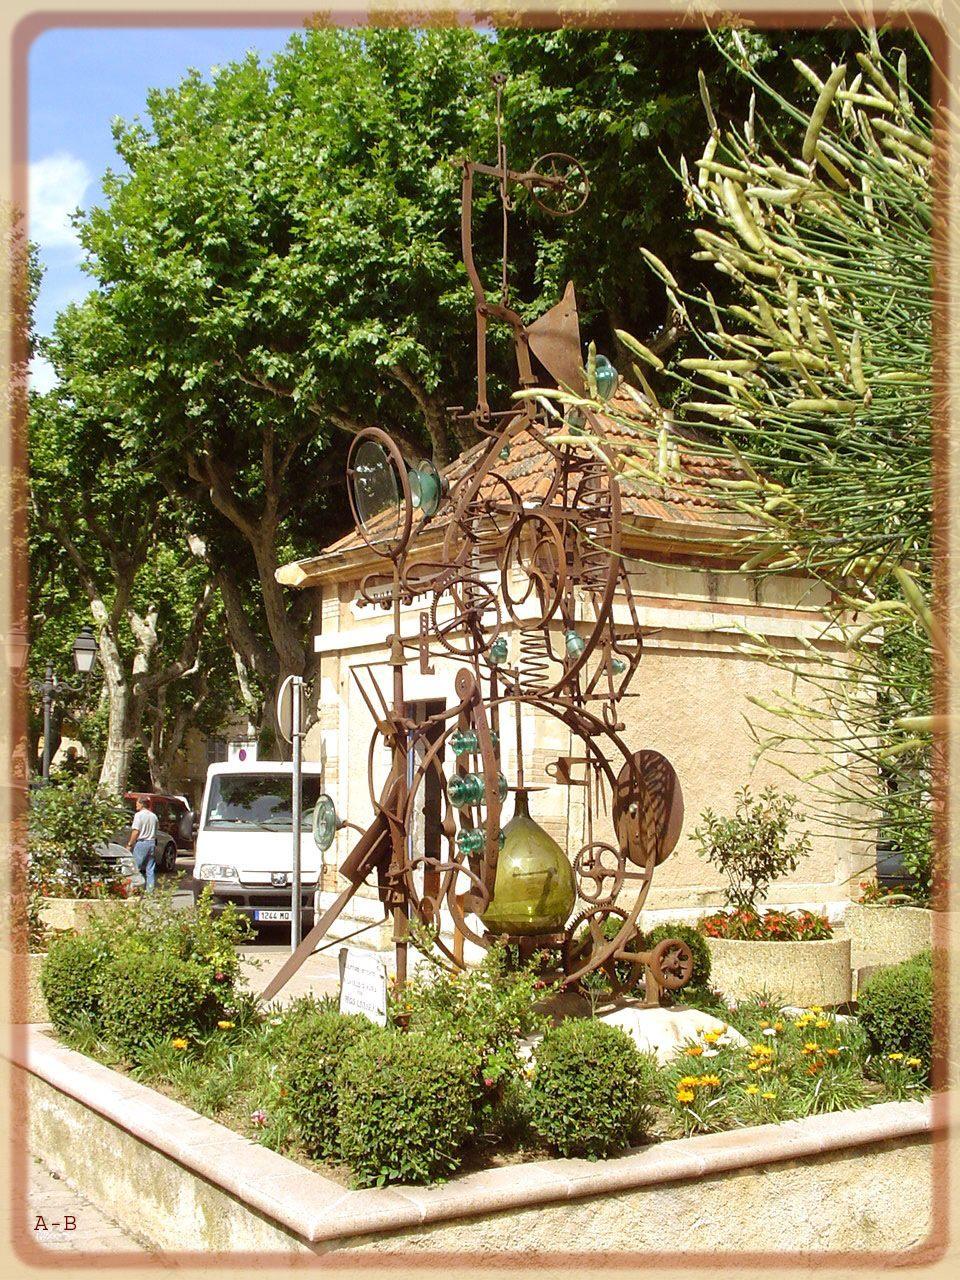 sculpturergisliveneauaups1.jpg